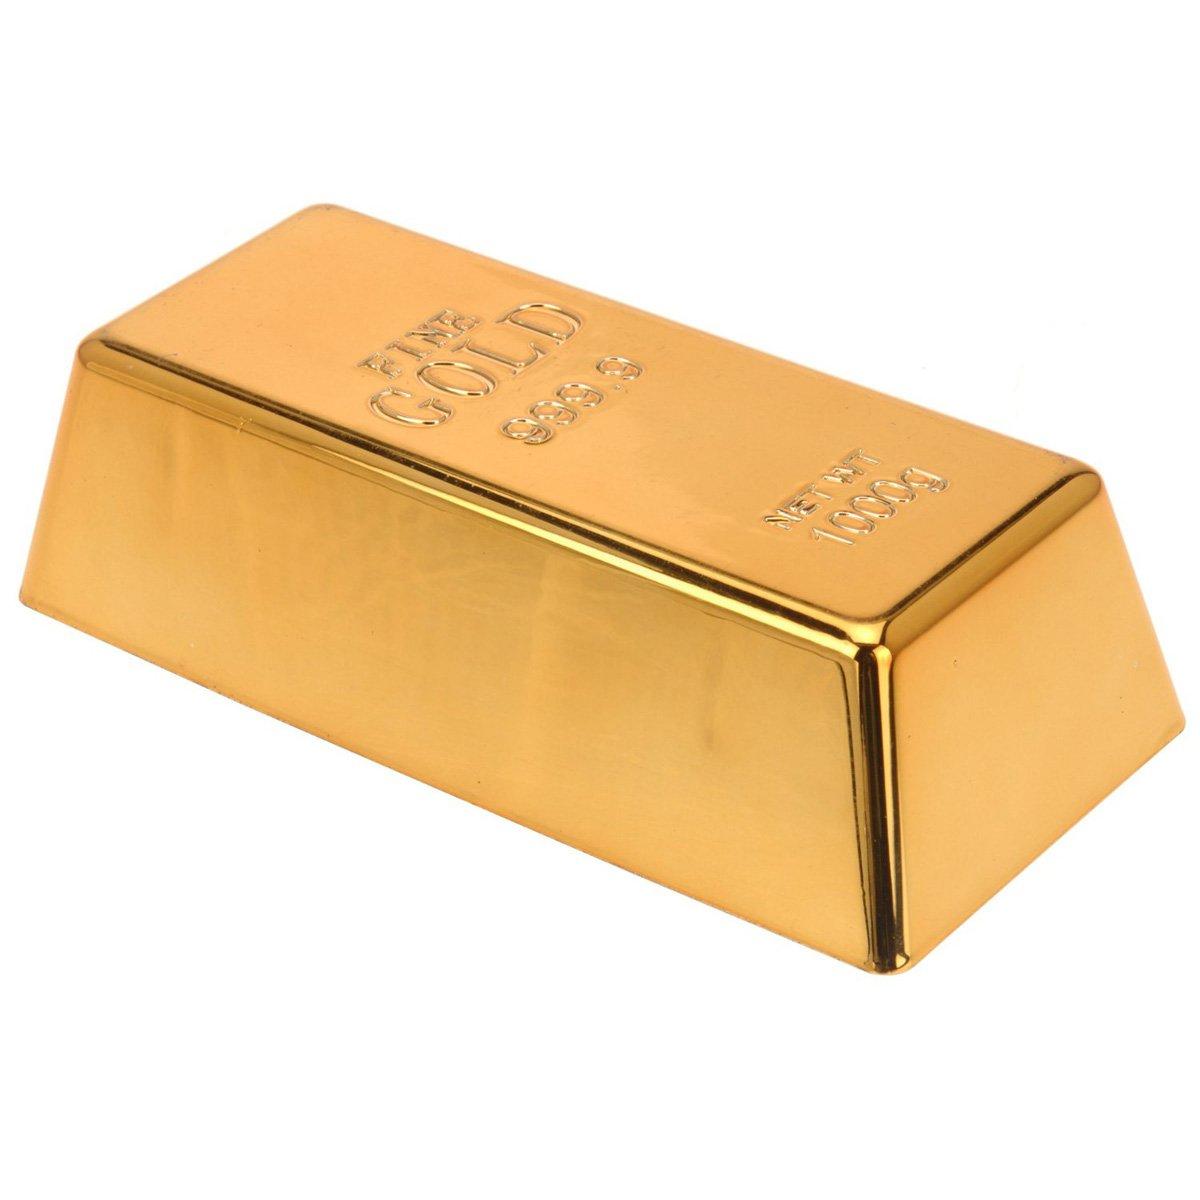 faux gold bar doorstop paperweight 5